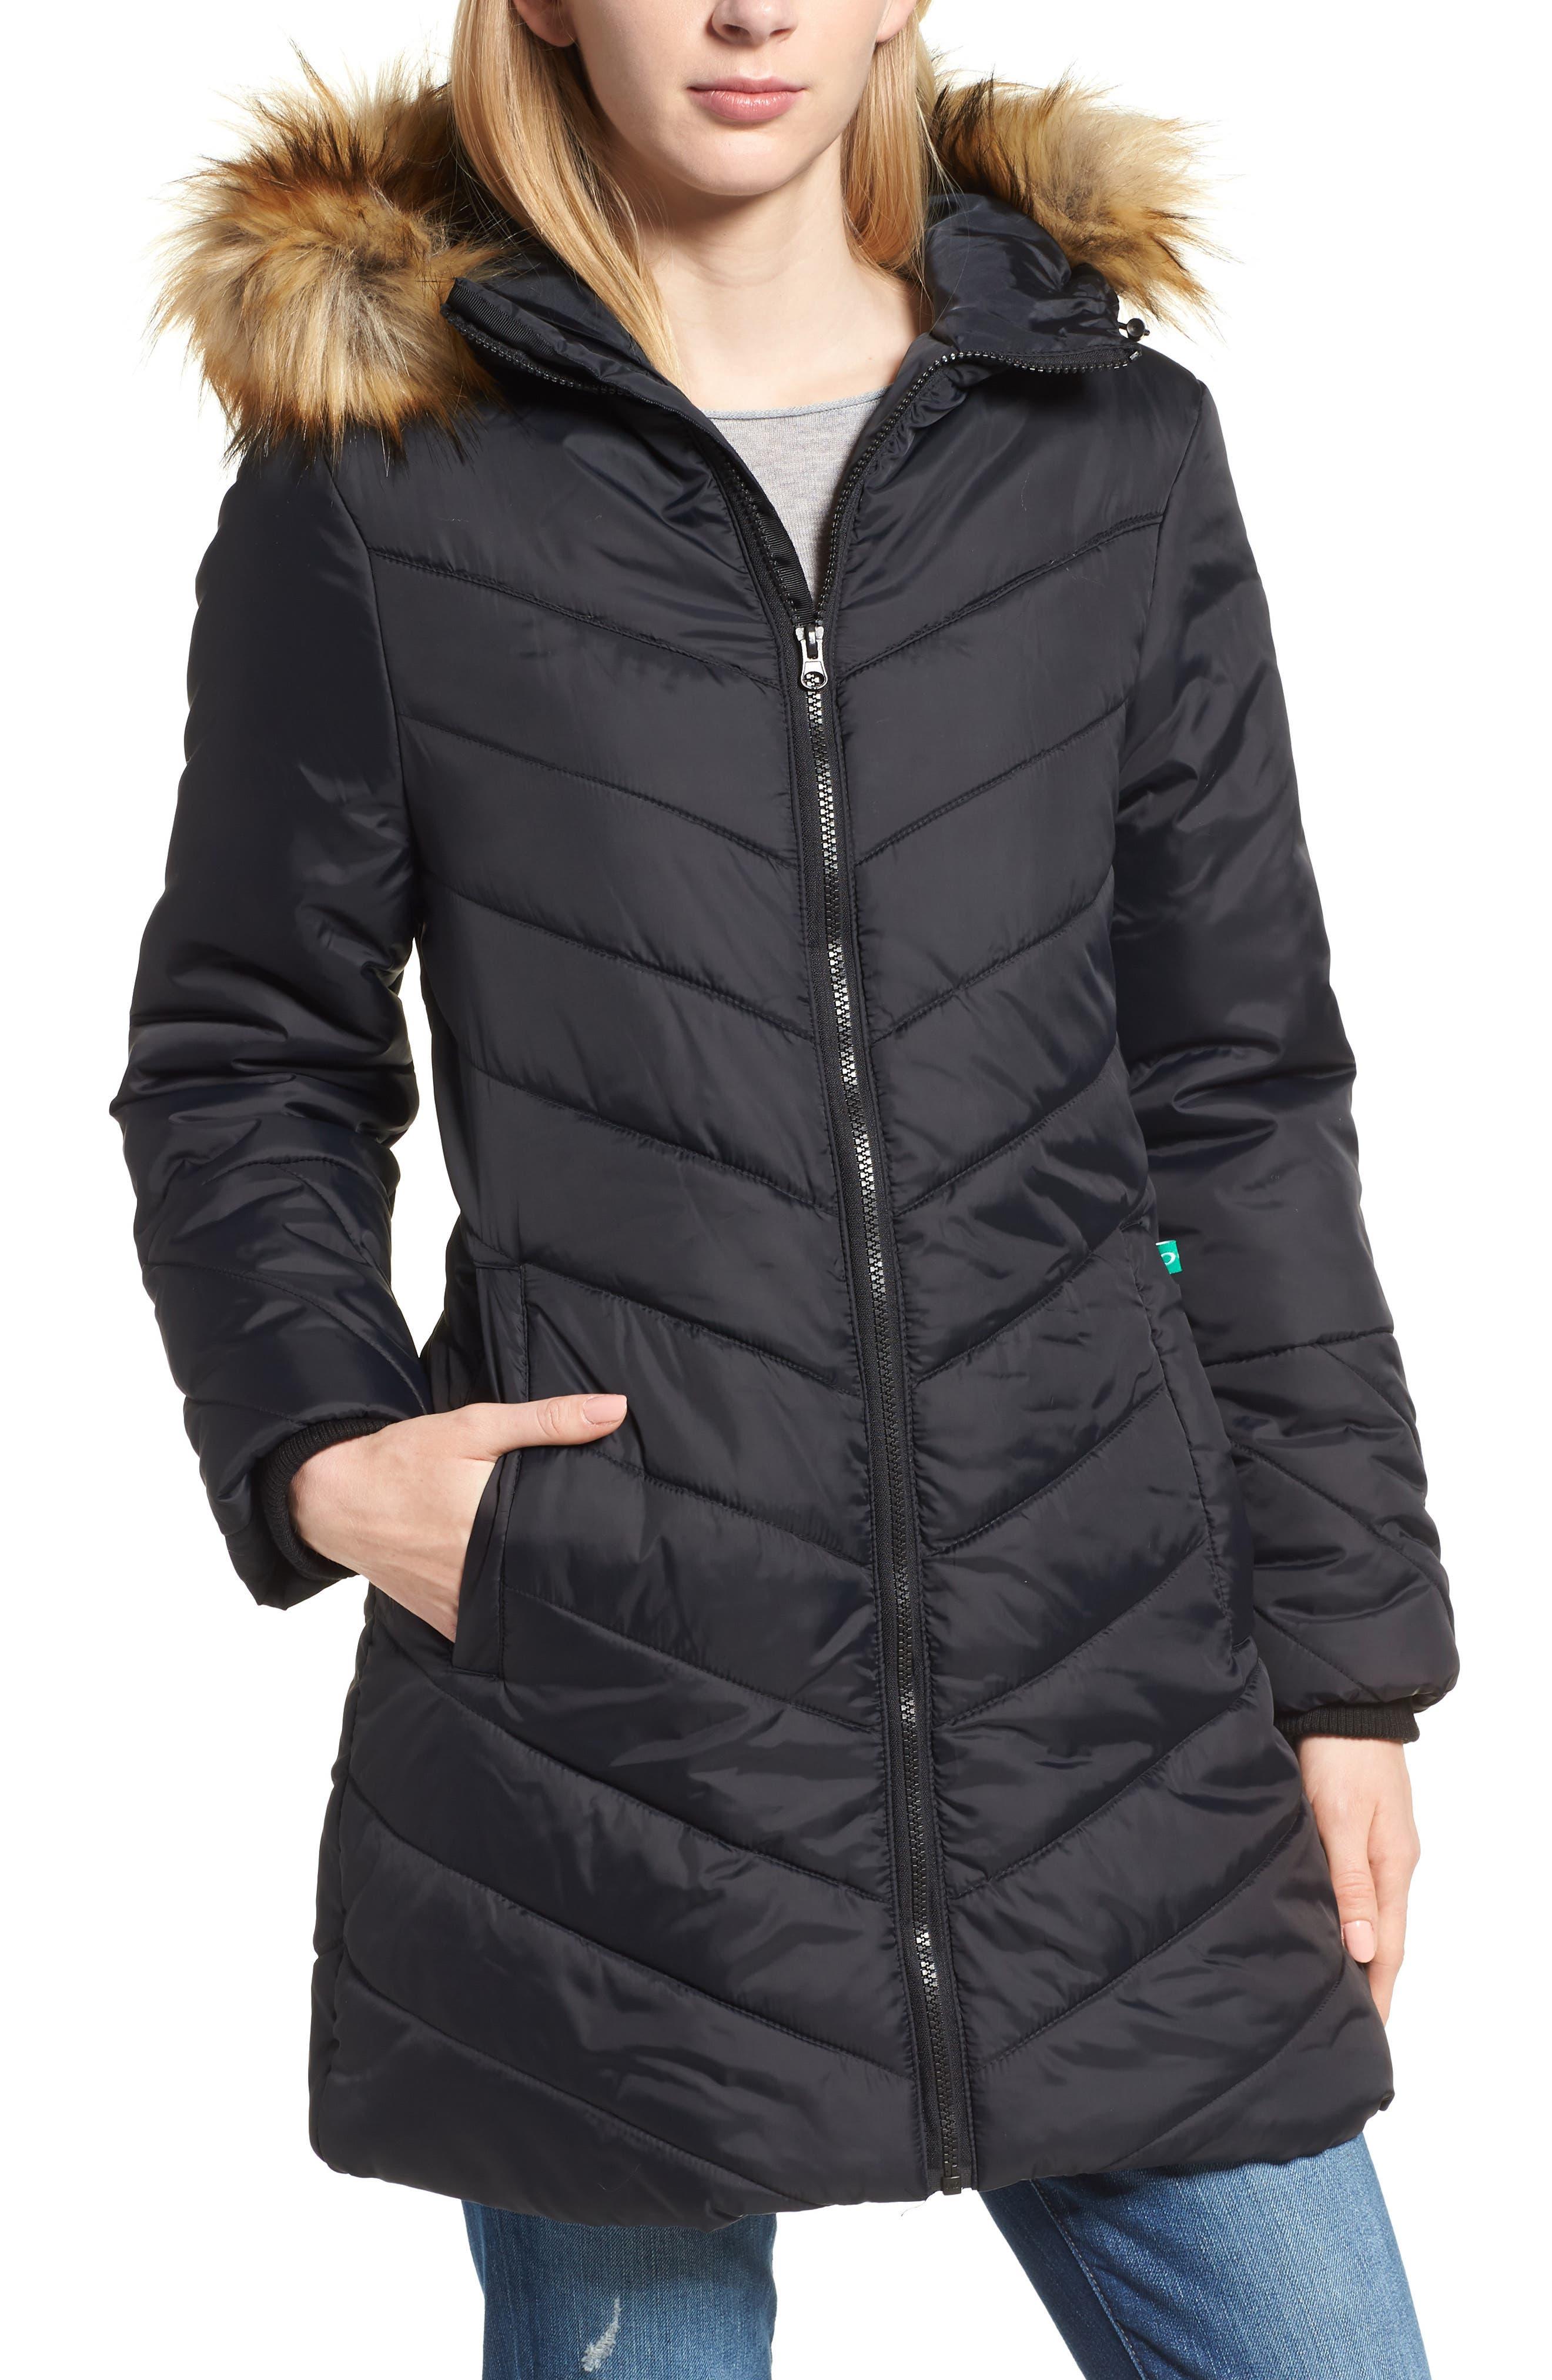 MODERN ETERNITY, Faux Fur Trim Convertible Puffer 3-in-1 Maternity Jacket, Alternate thumbnail 2, color, BLACK